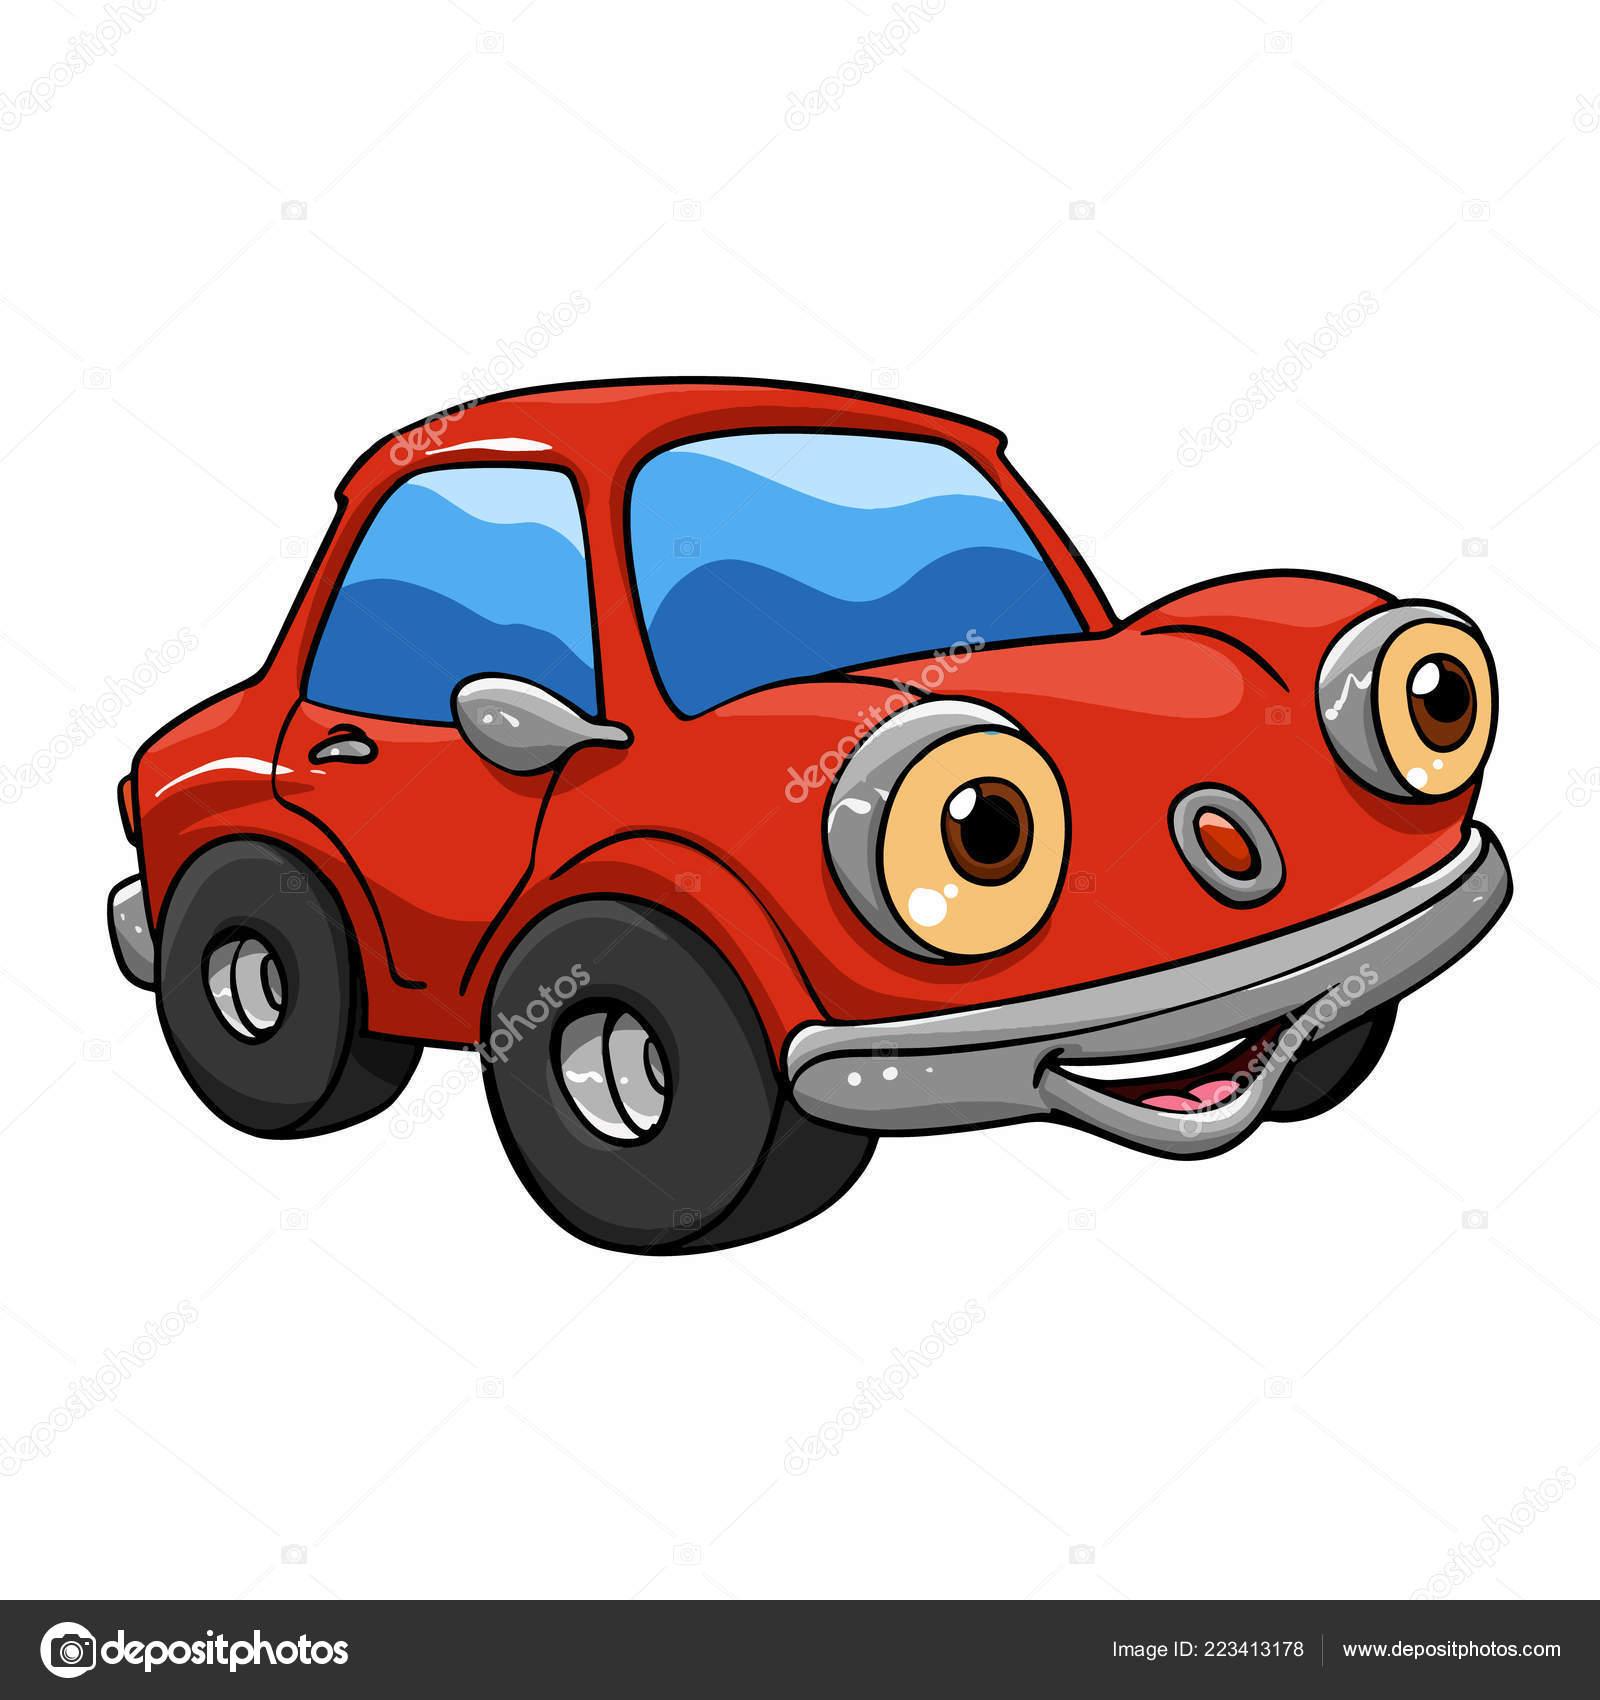 Funny Cars Rouge Voiture Dessin Animé Illustration